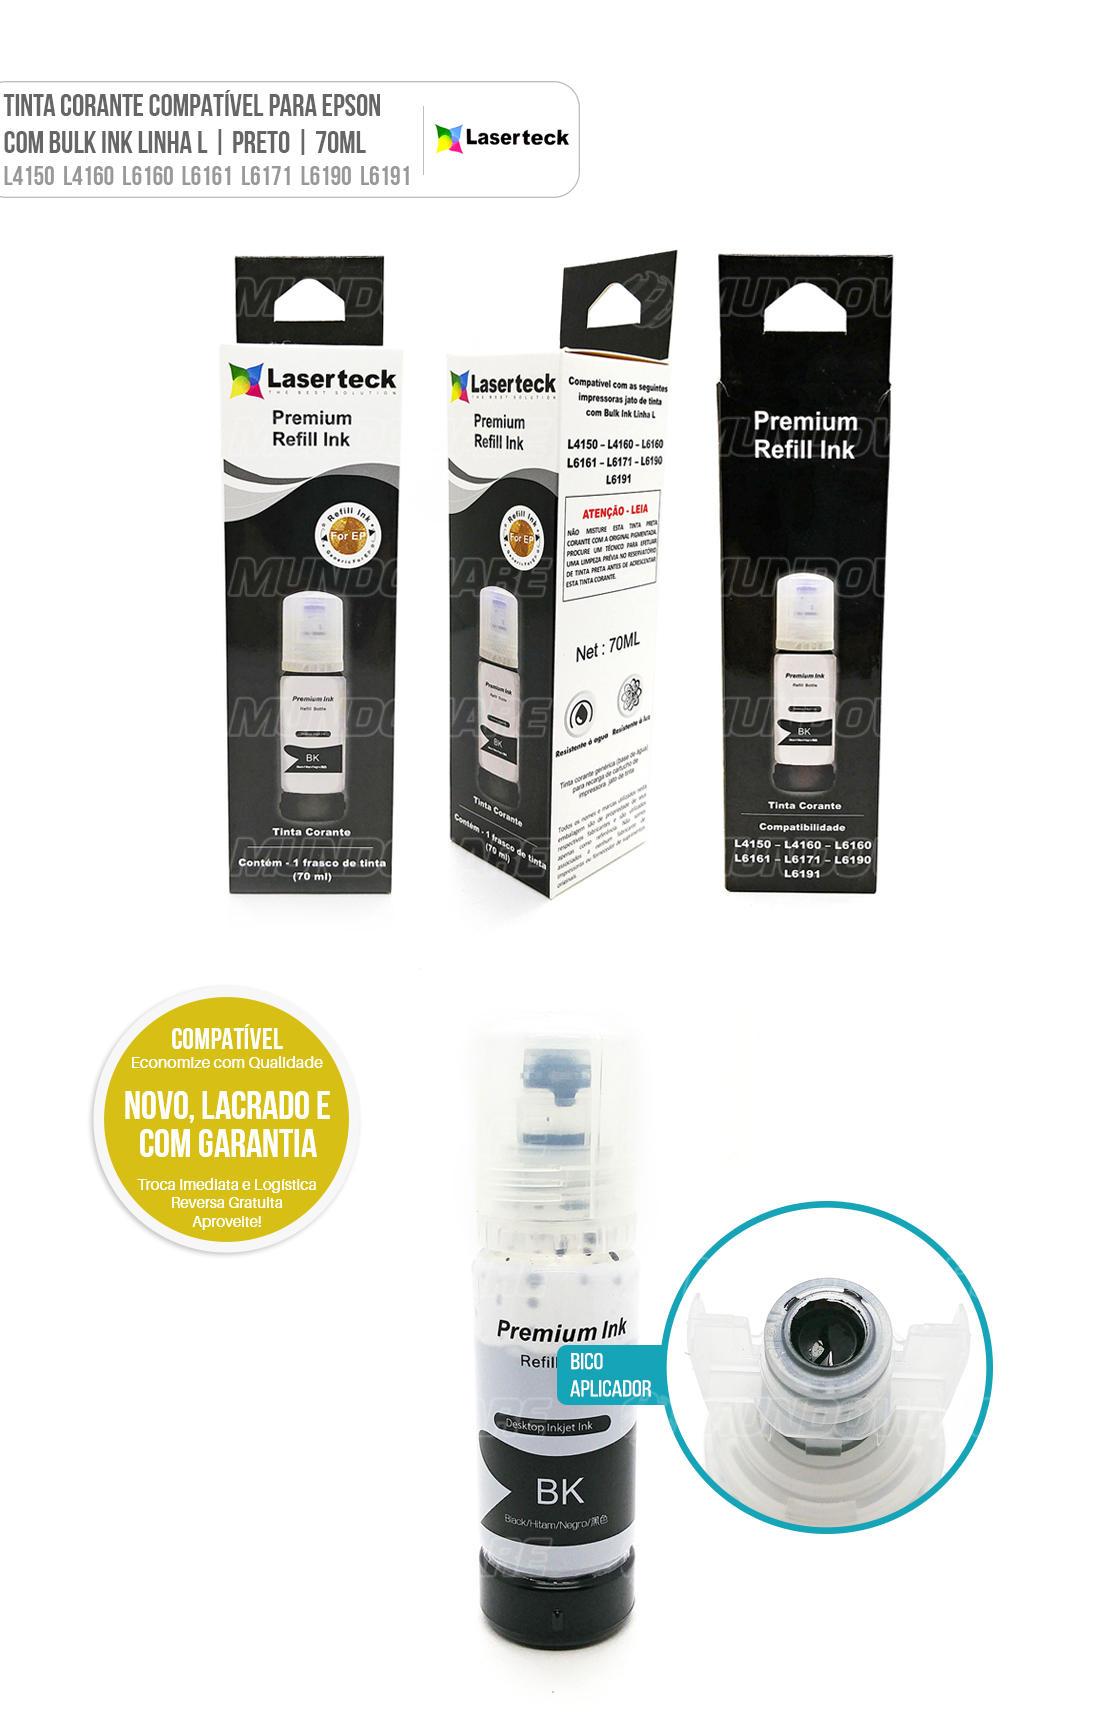 Tinta Preta Corante Compatível para impressora Jato de Tinta com Bulk Ink Linha L modelos L4150 L4160 L6160 L6161 L6171 L6190 L6191 L 4150 L 4160 L 6160 L 6161 L 6171 L 6190 L 6191